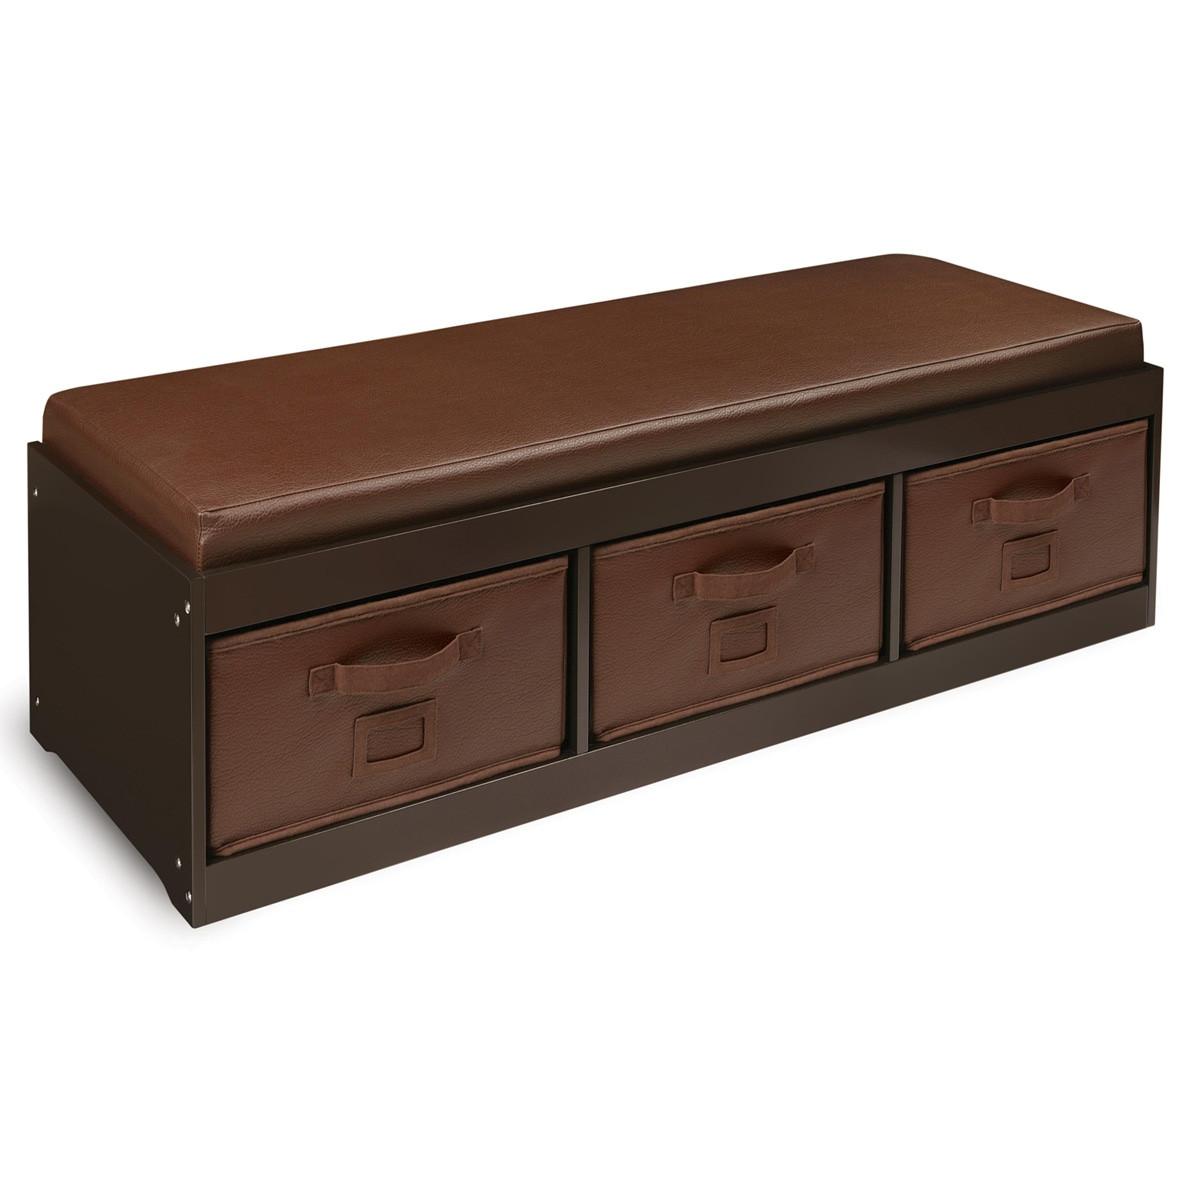 Storage Bench Kids  Shop Espresso Kid s Storage Bench with Espresso Bins